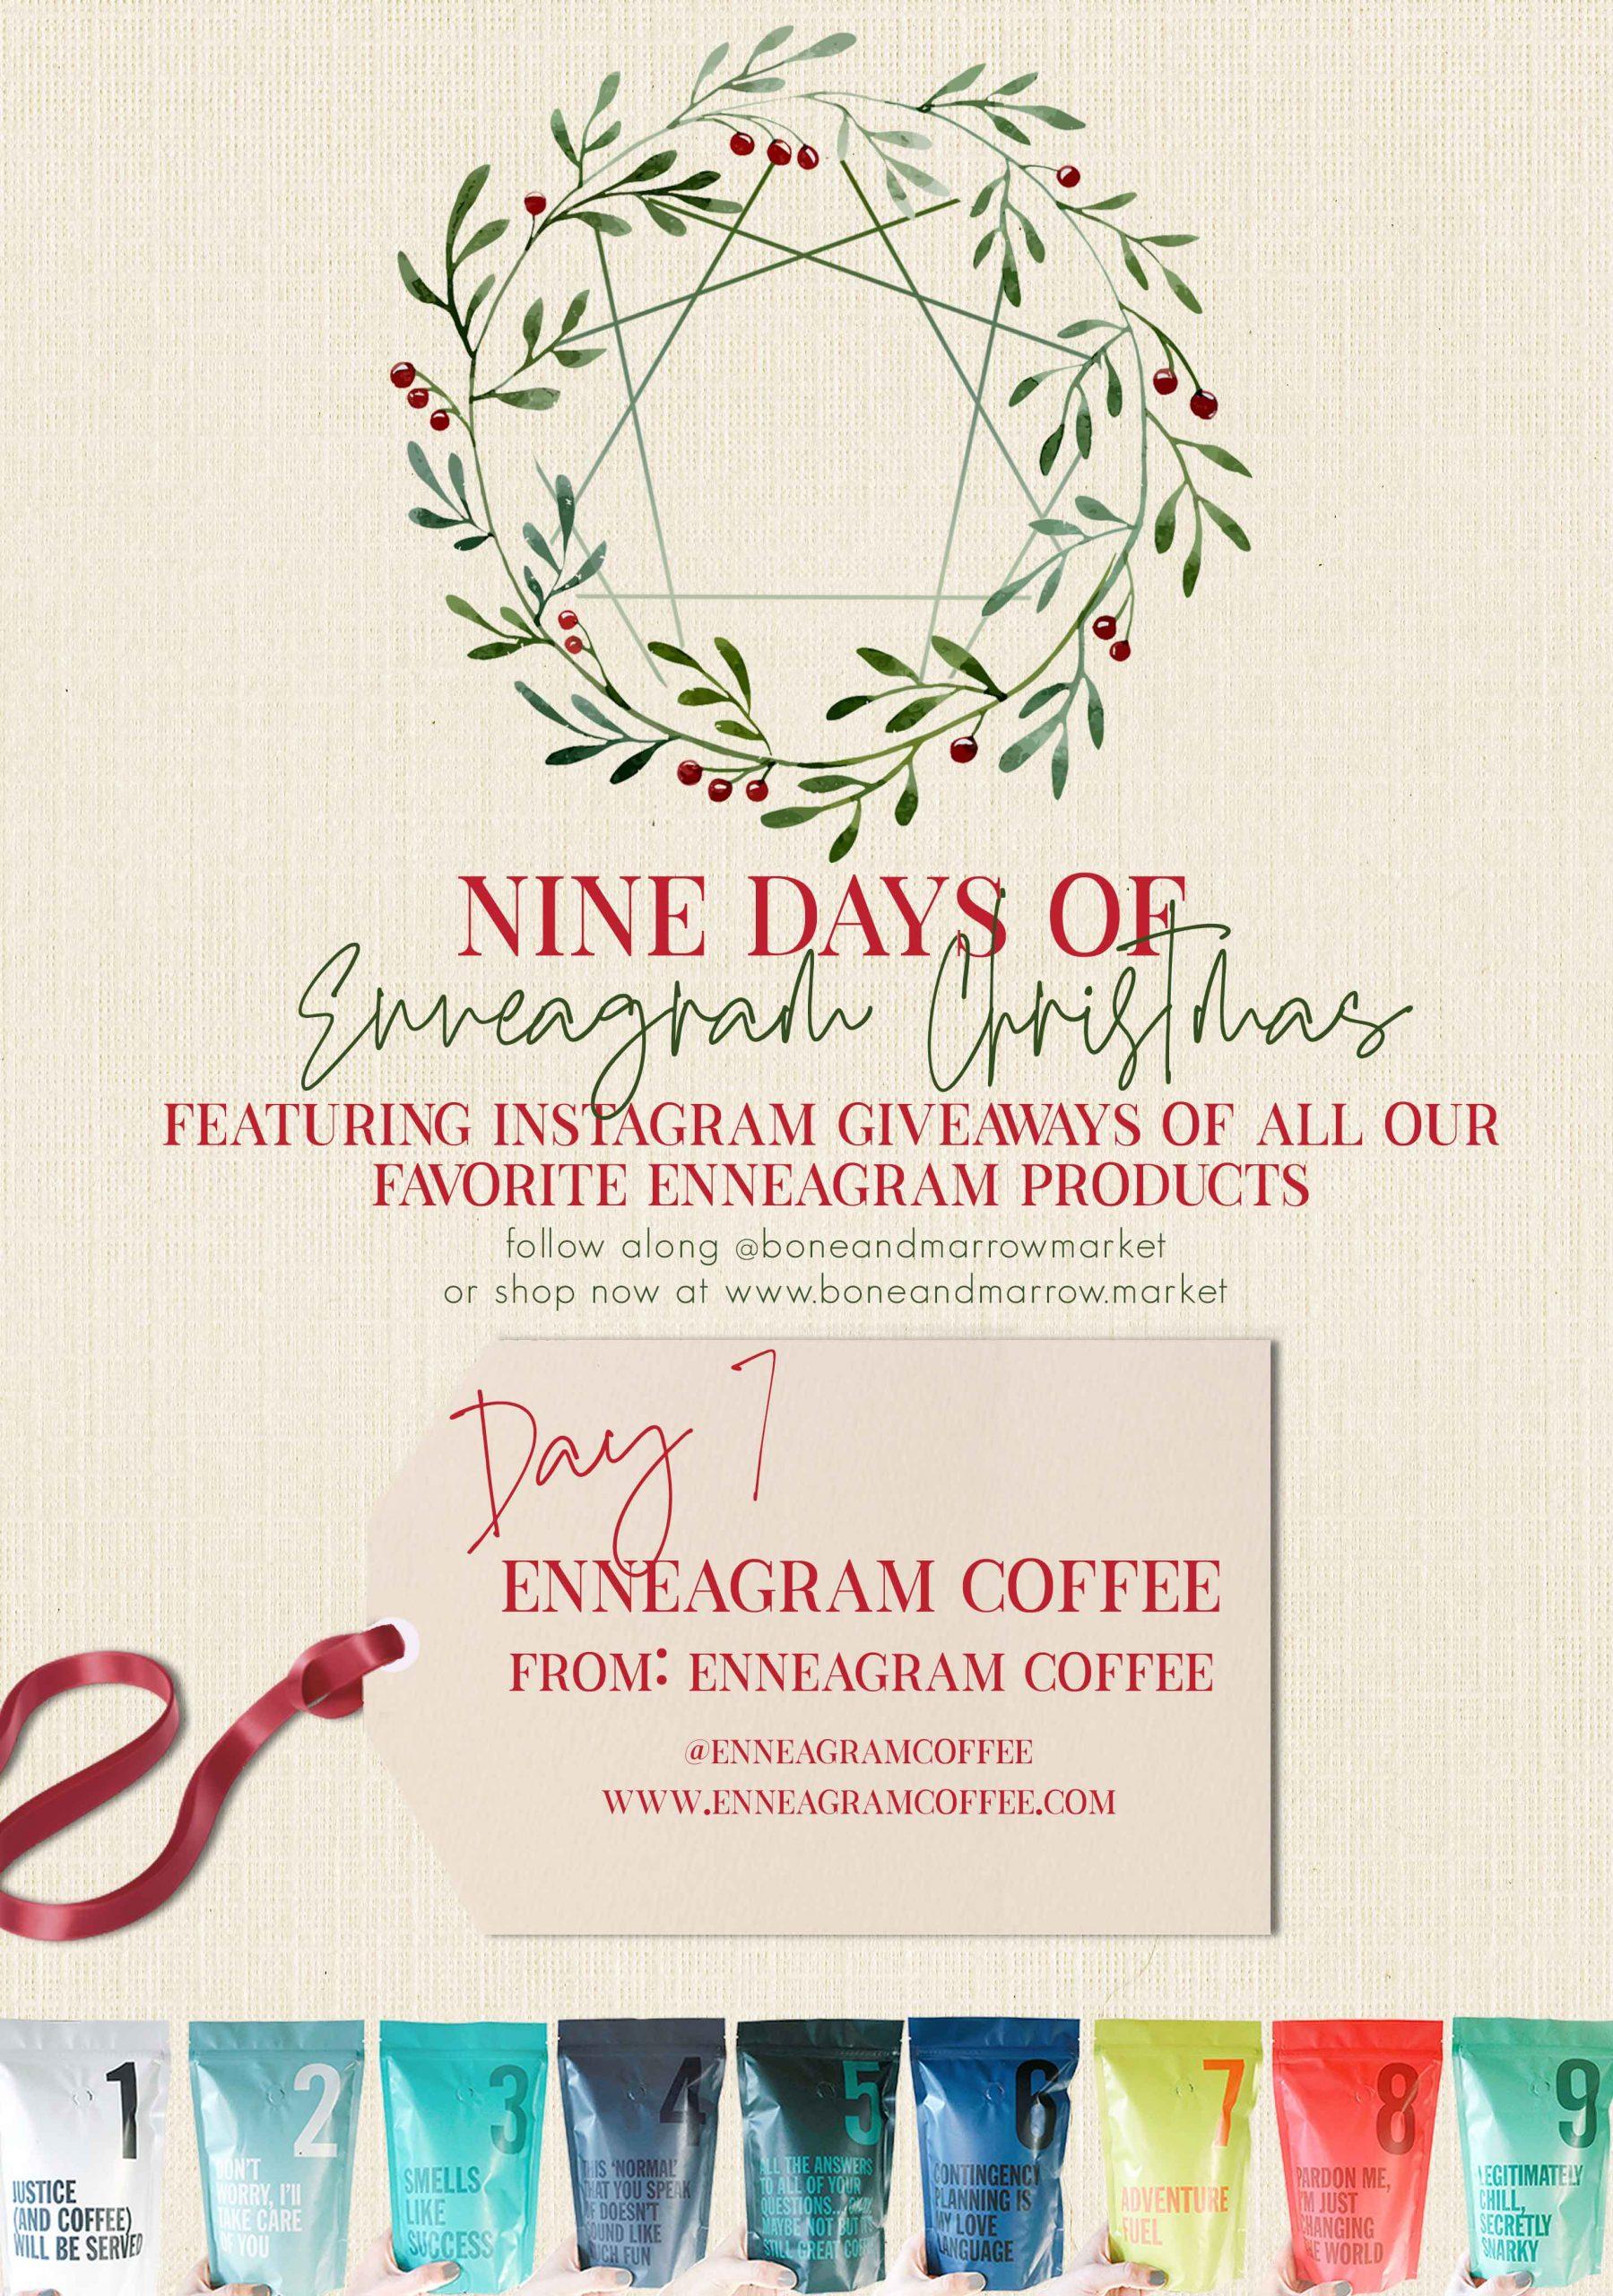 Enneagram Coffee | 9 Days of Enneagram Christmas